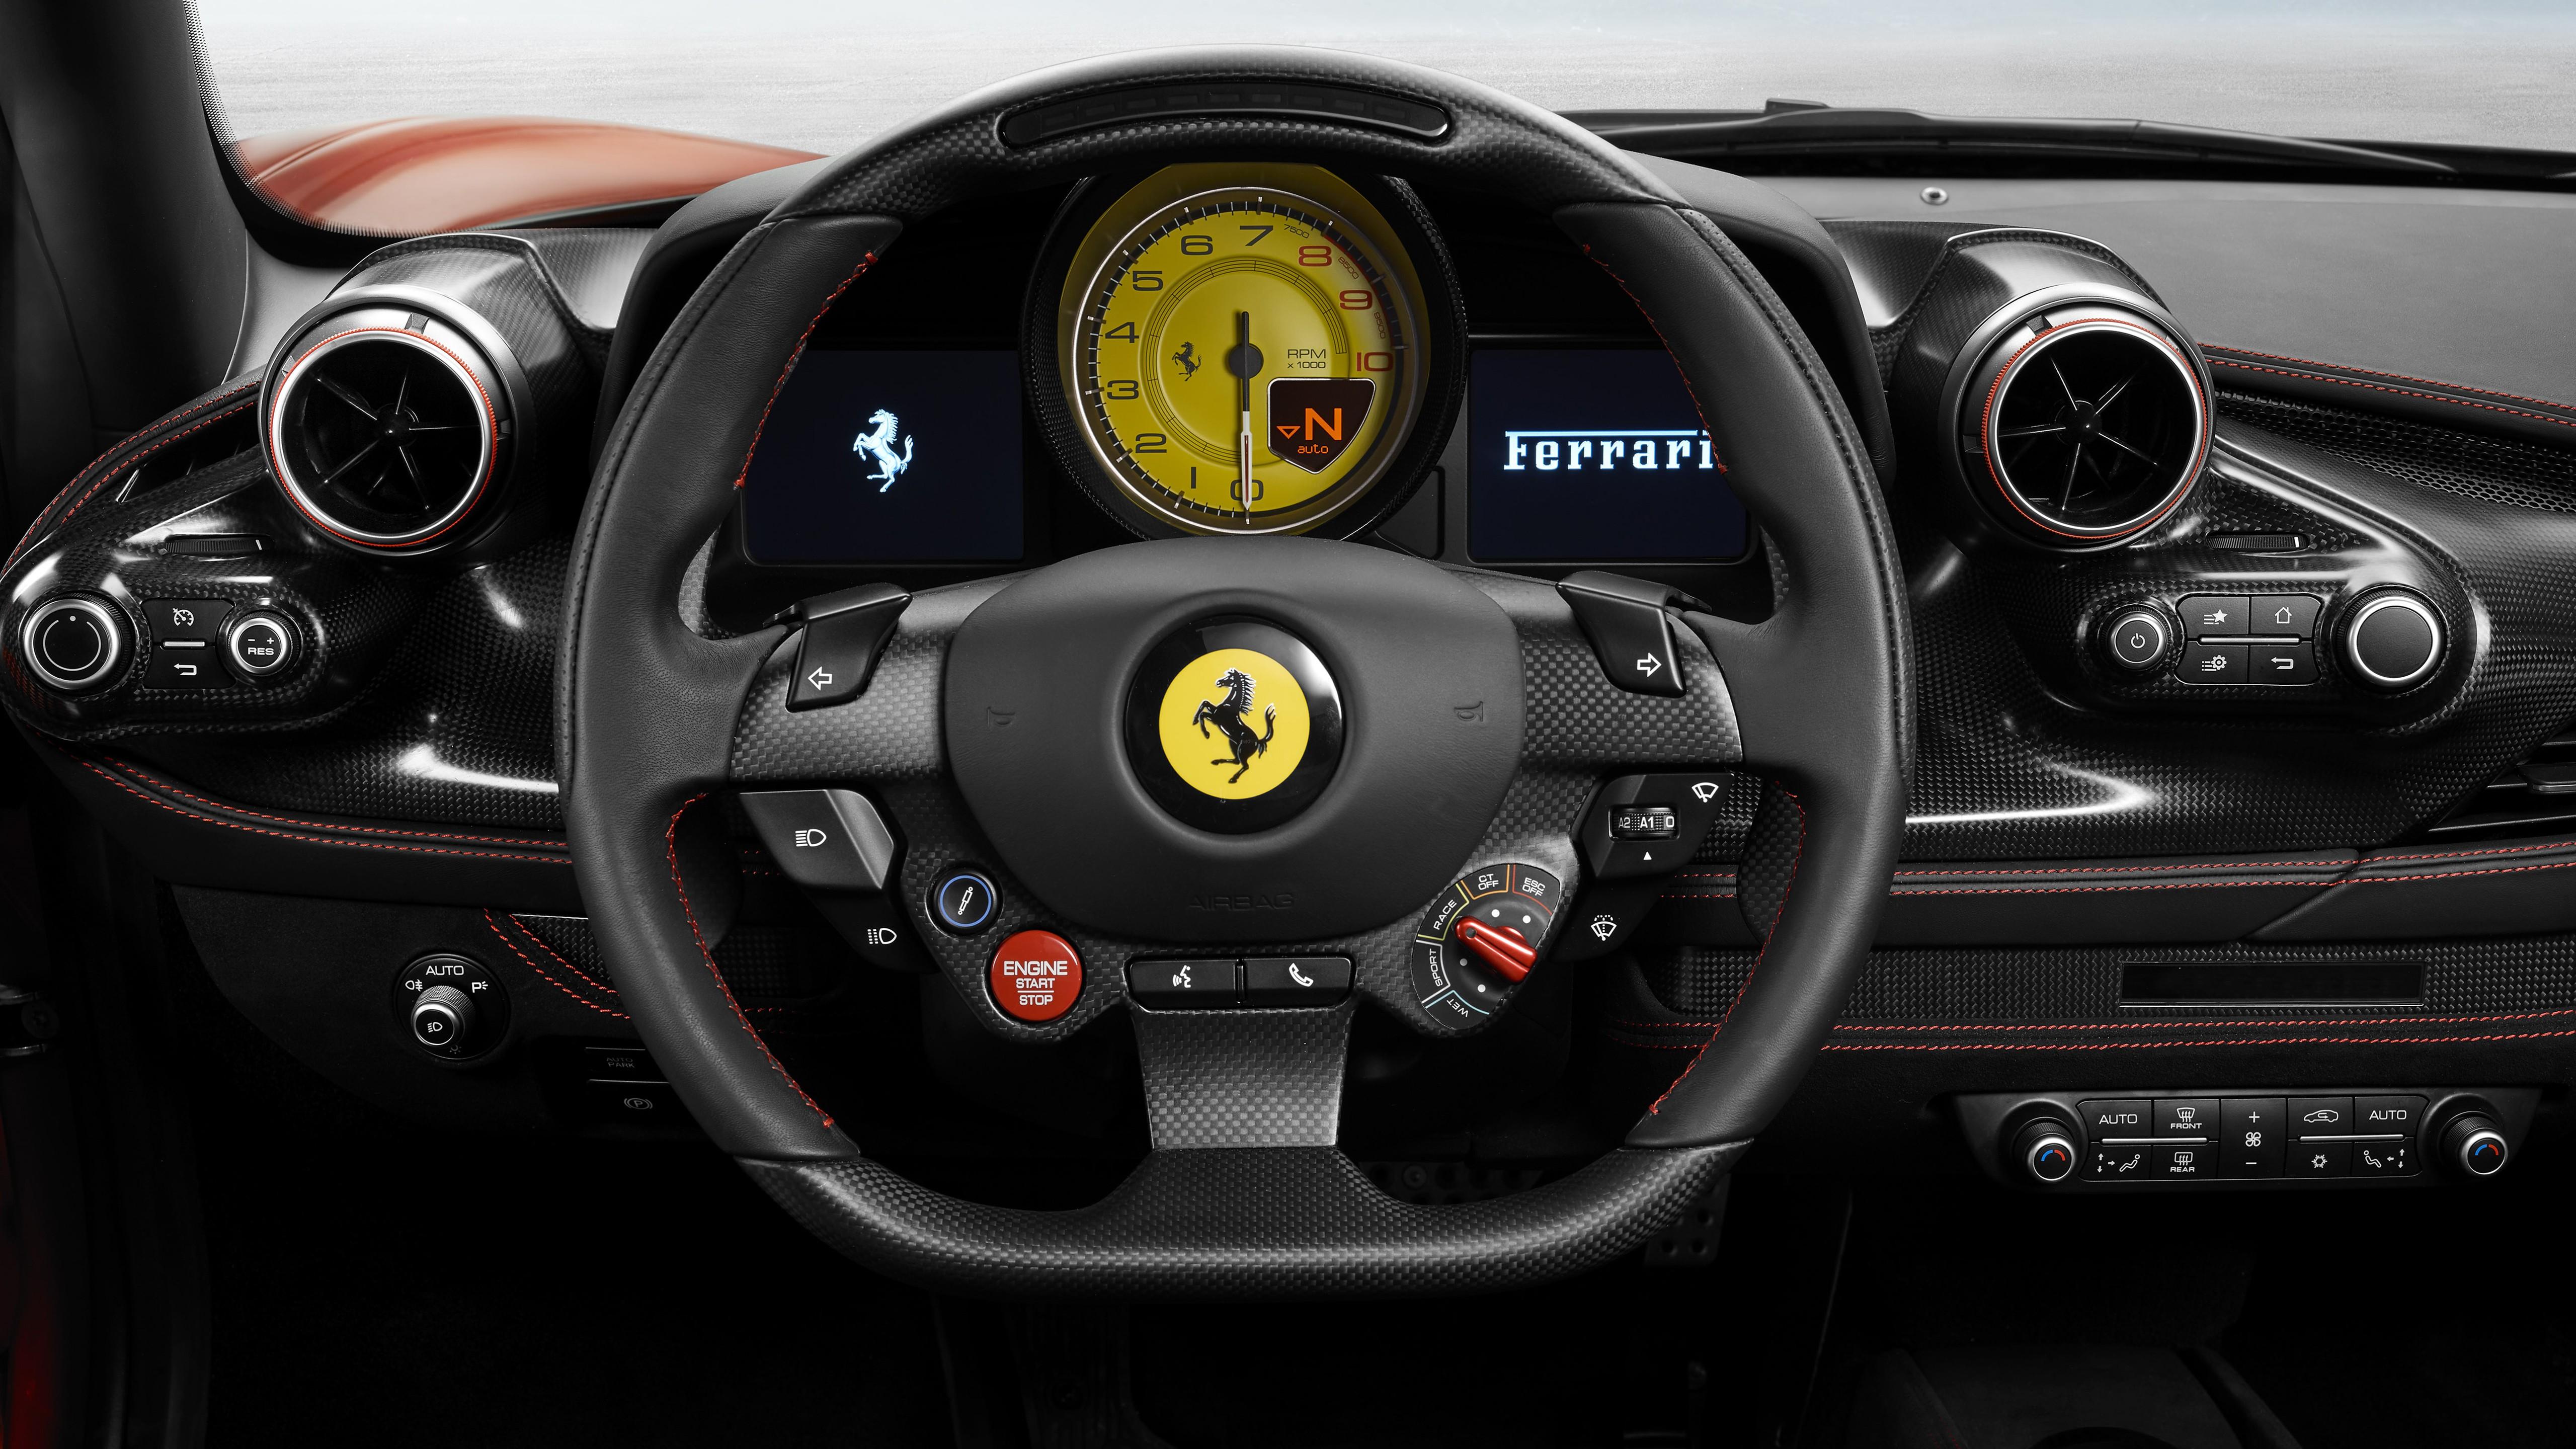 General 5120x2880 vehicle interiors Ferrari car car interior steering wheel numbers